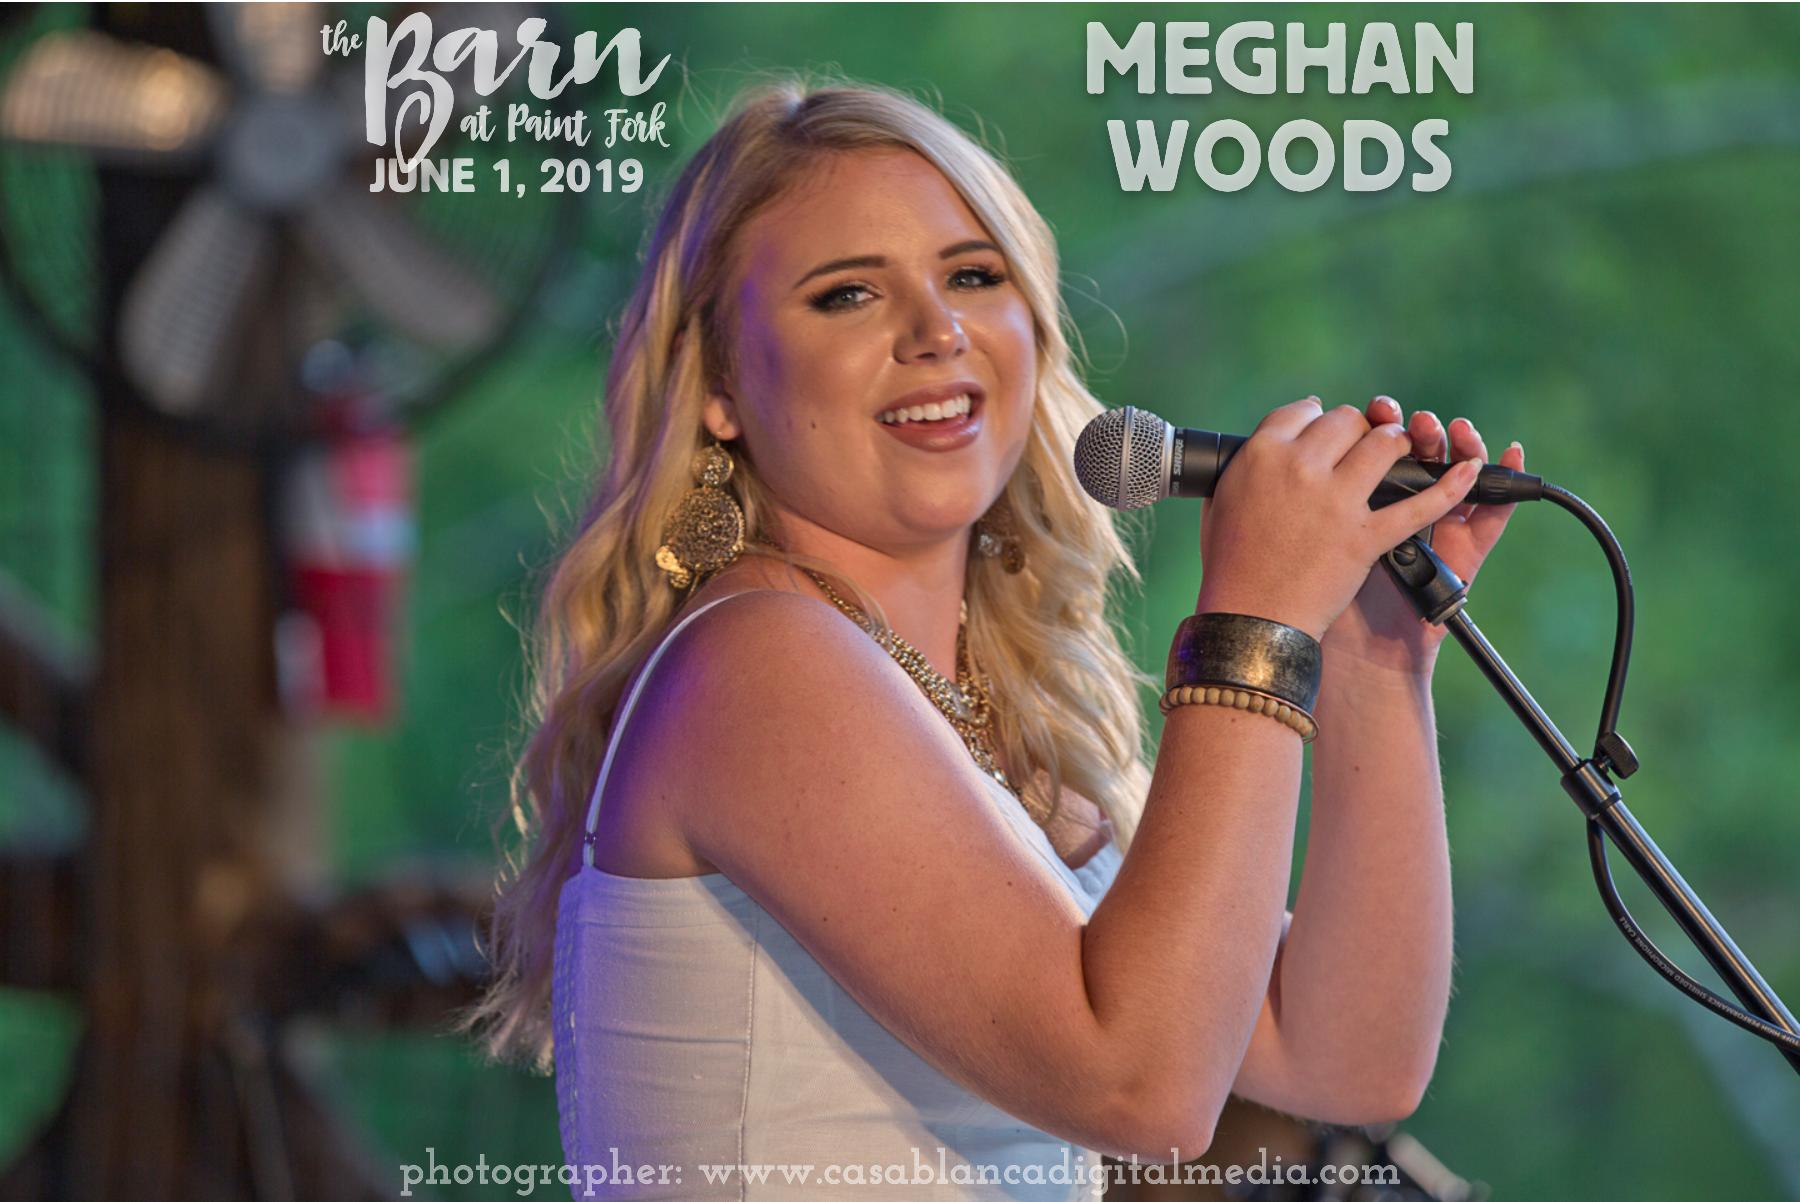 Megan Woods